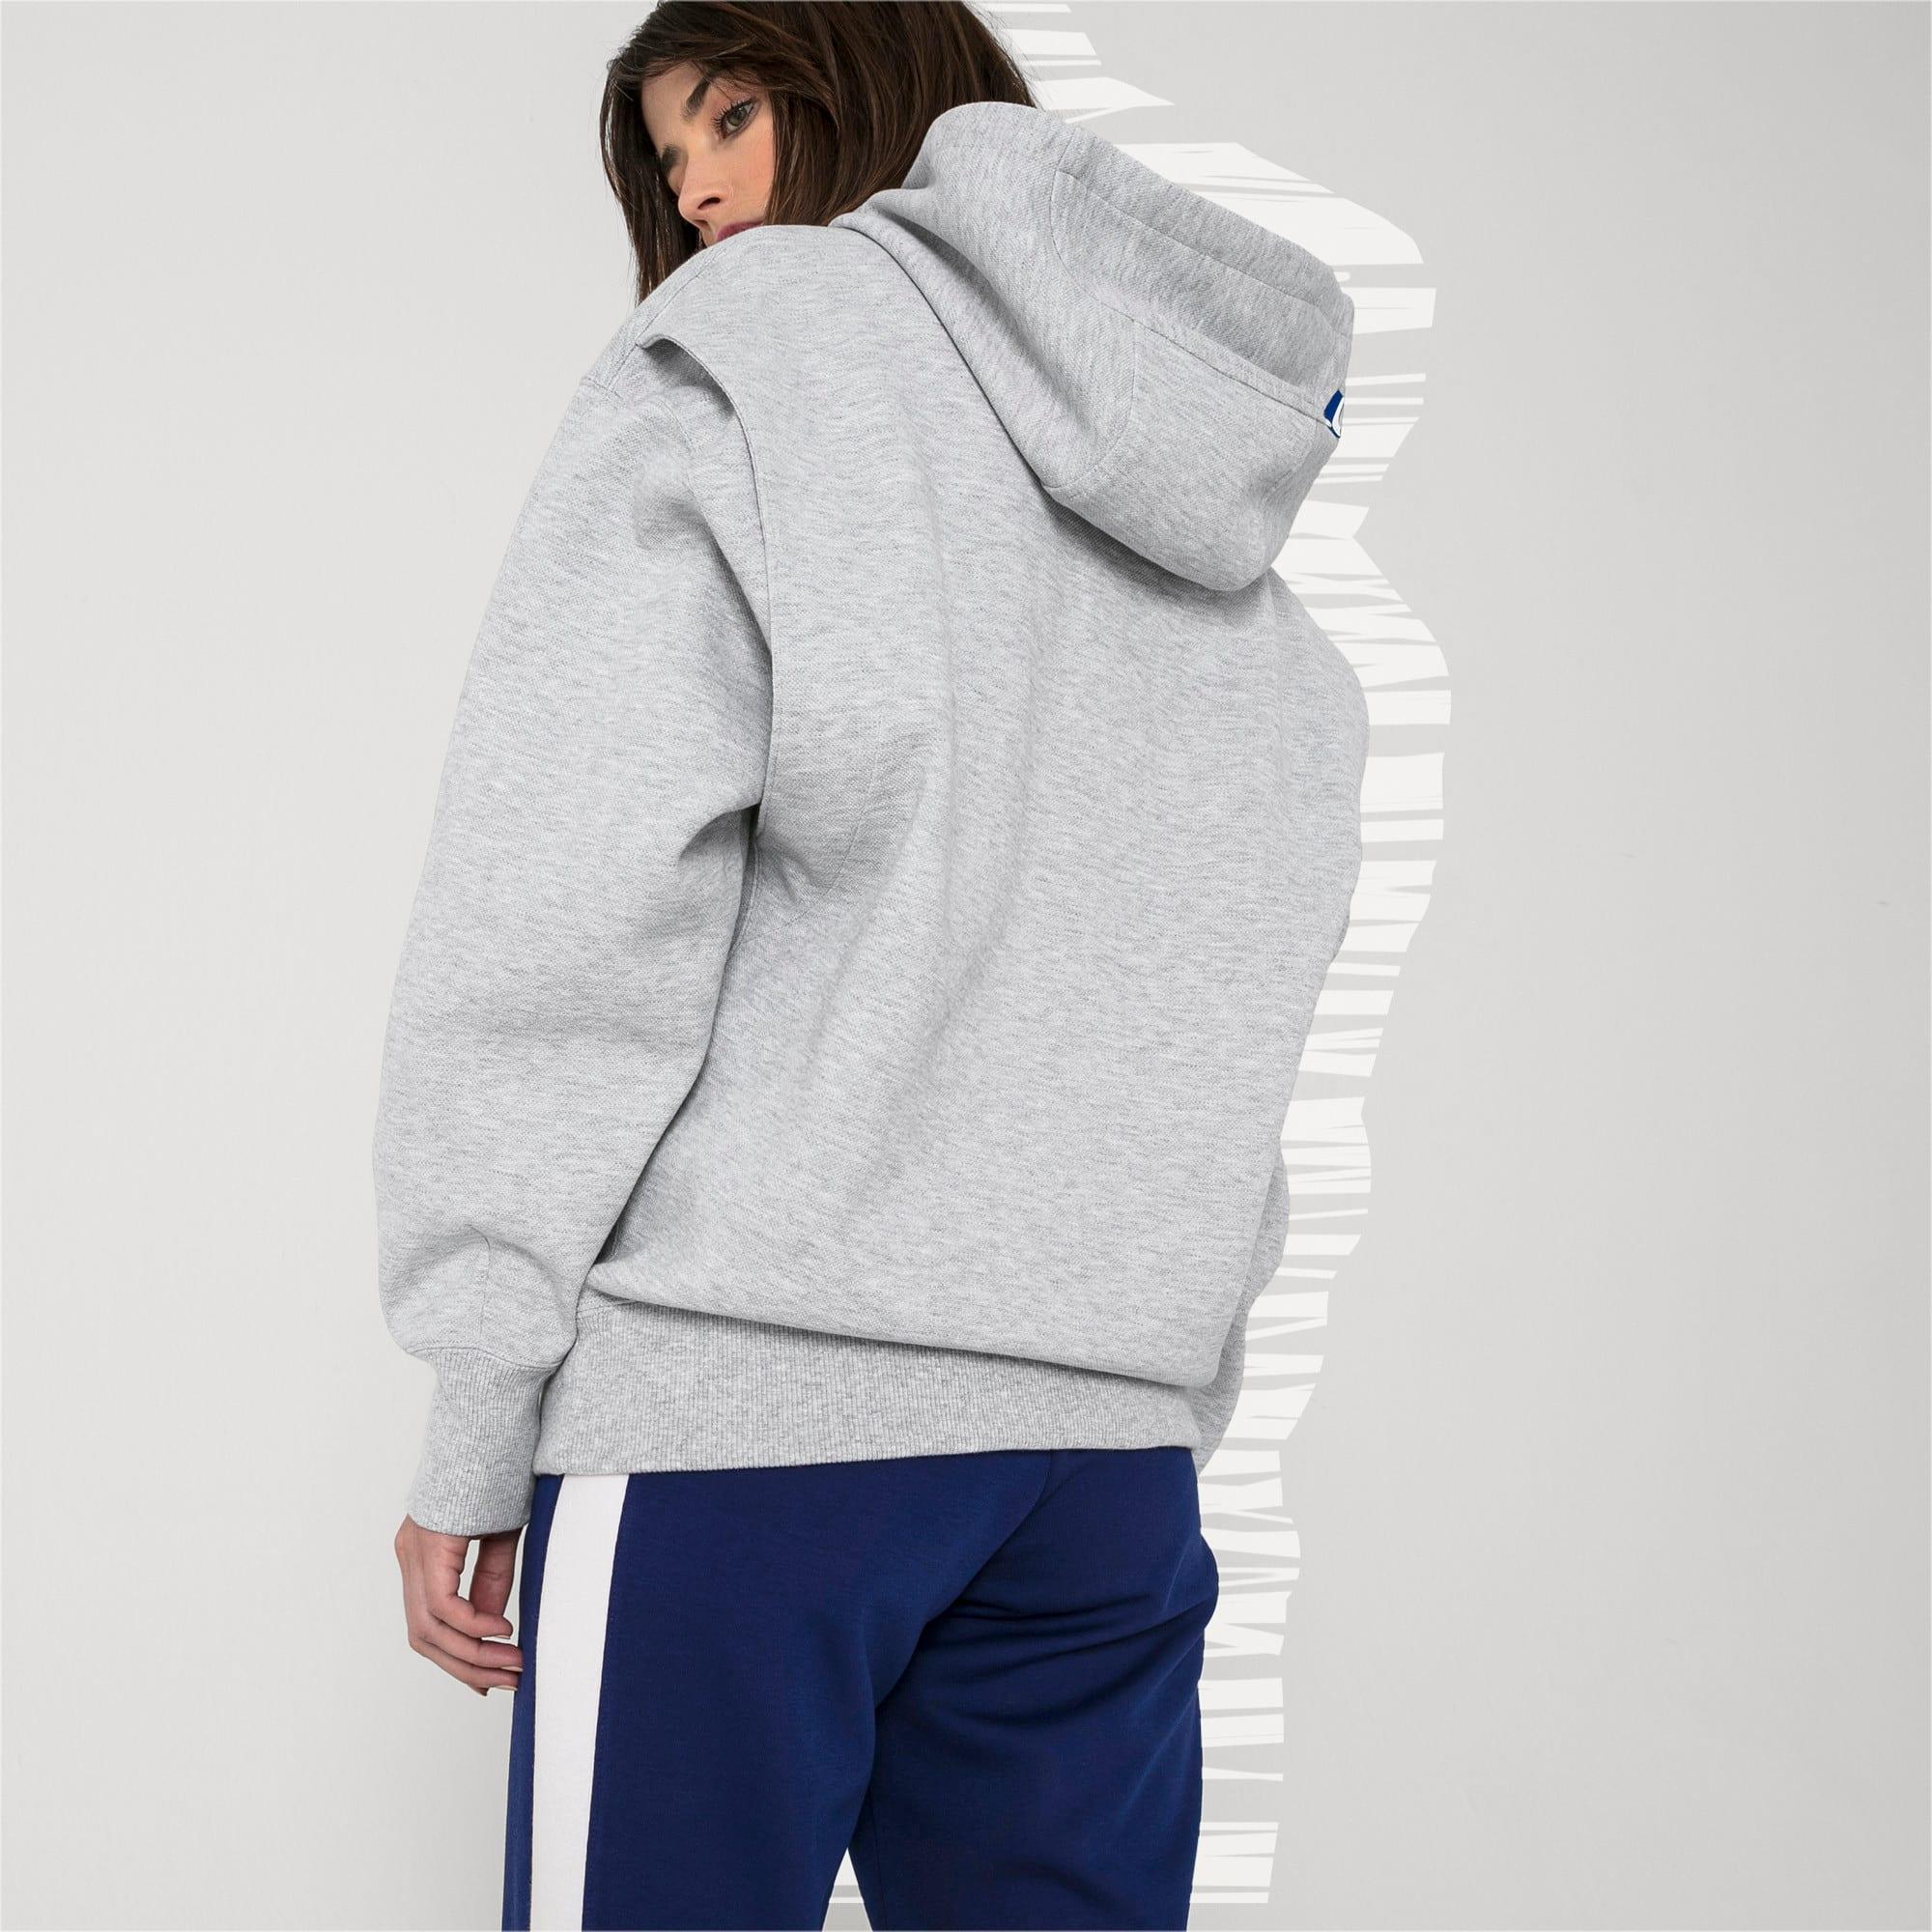 Thumbnail 7 of PUMA x ADER ERROR hoodie, Light Gray Heather, medium